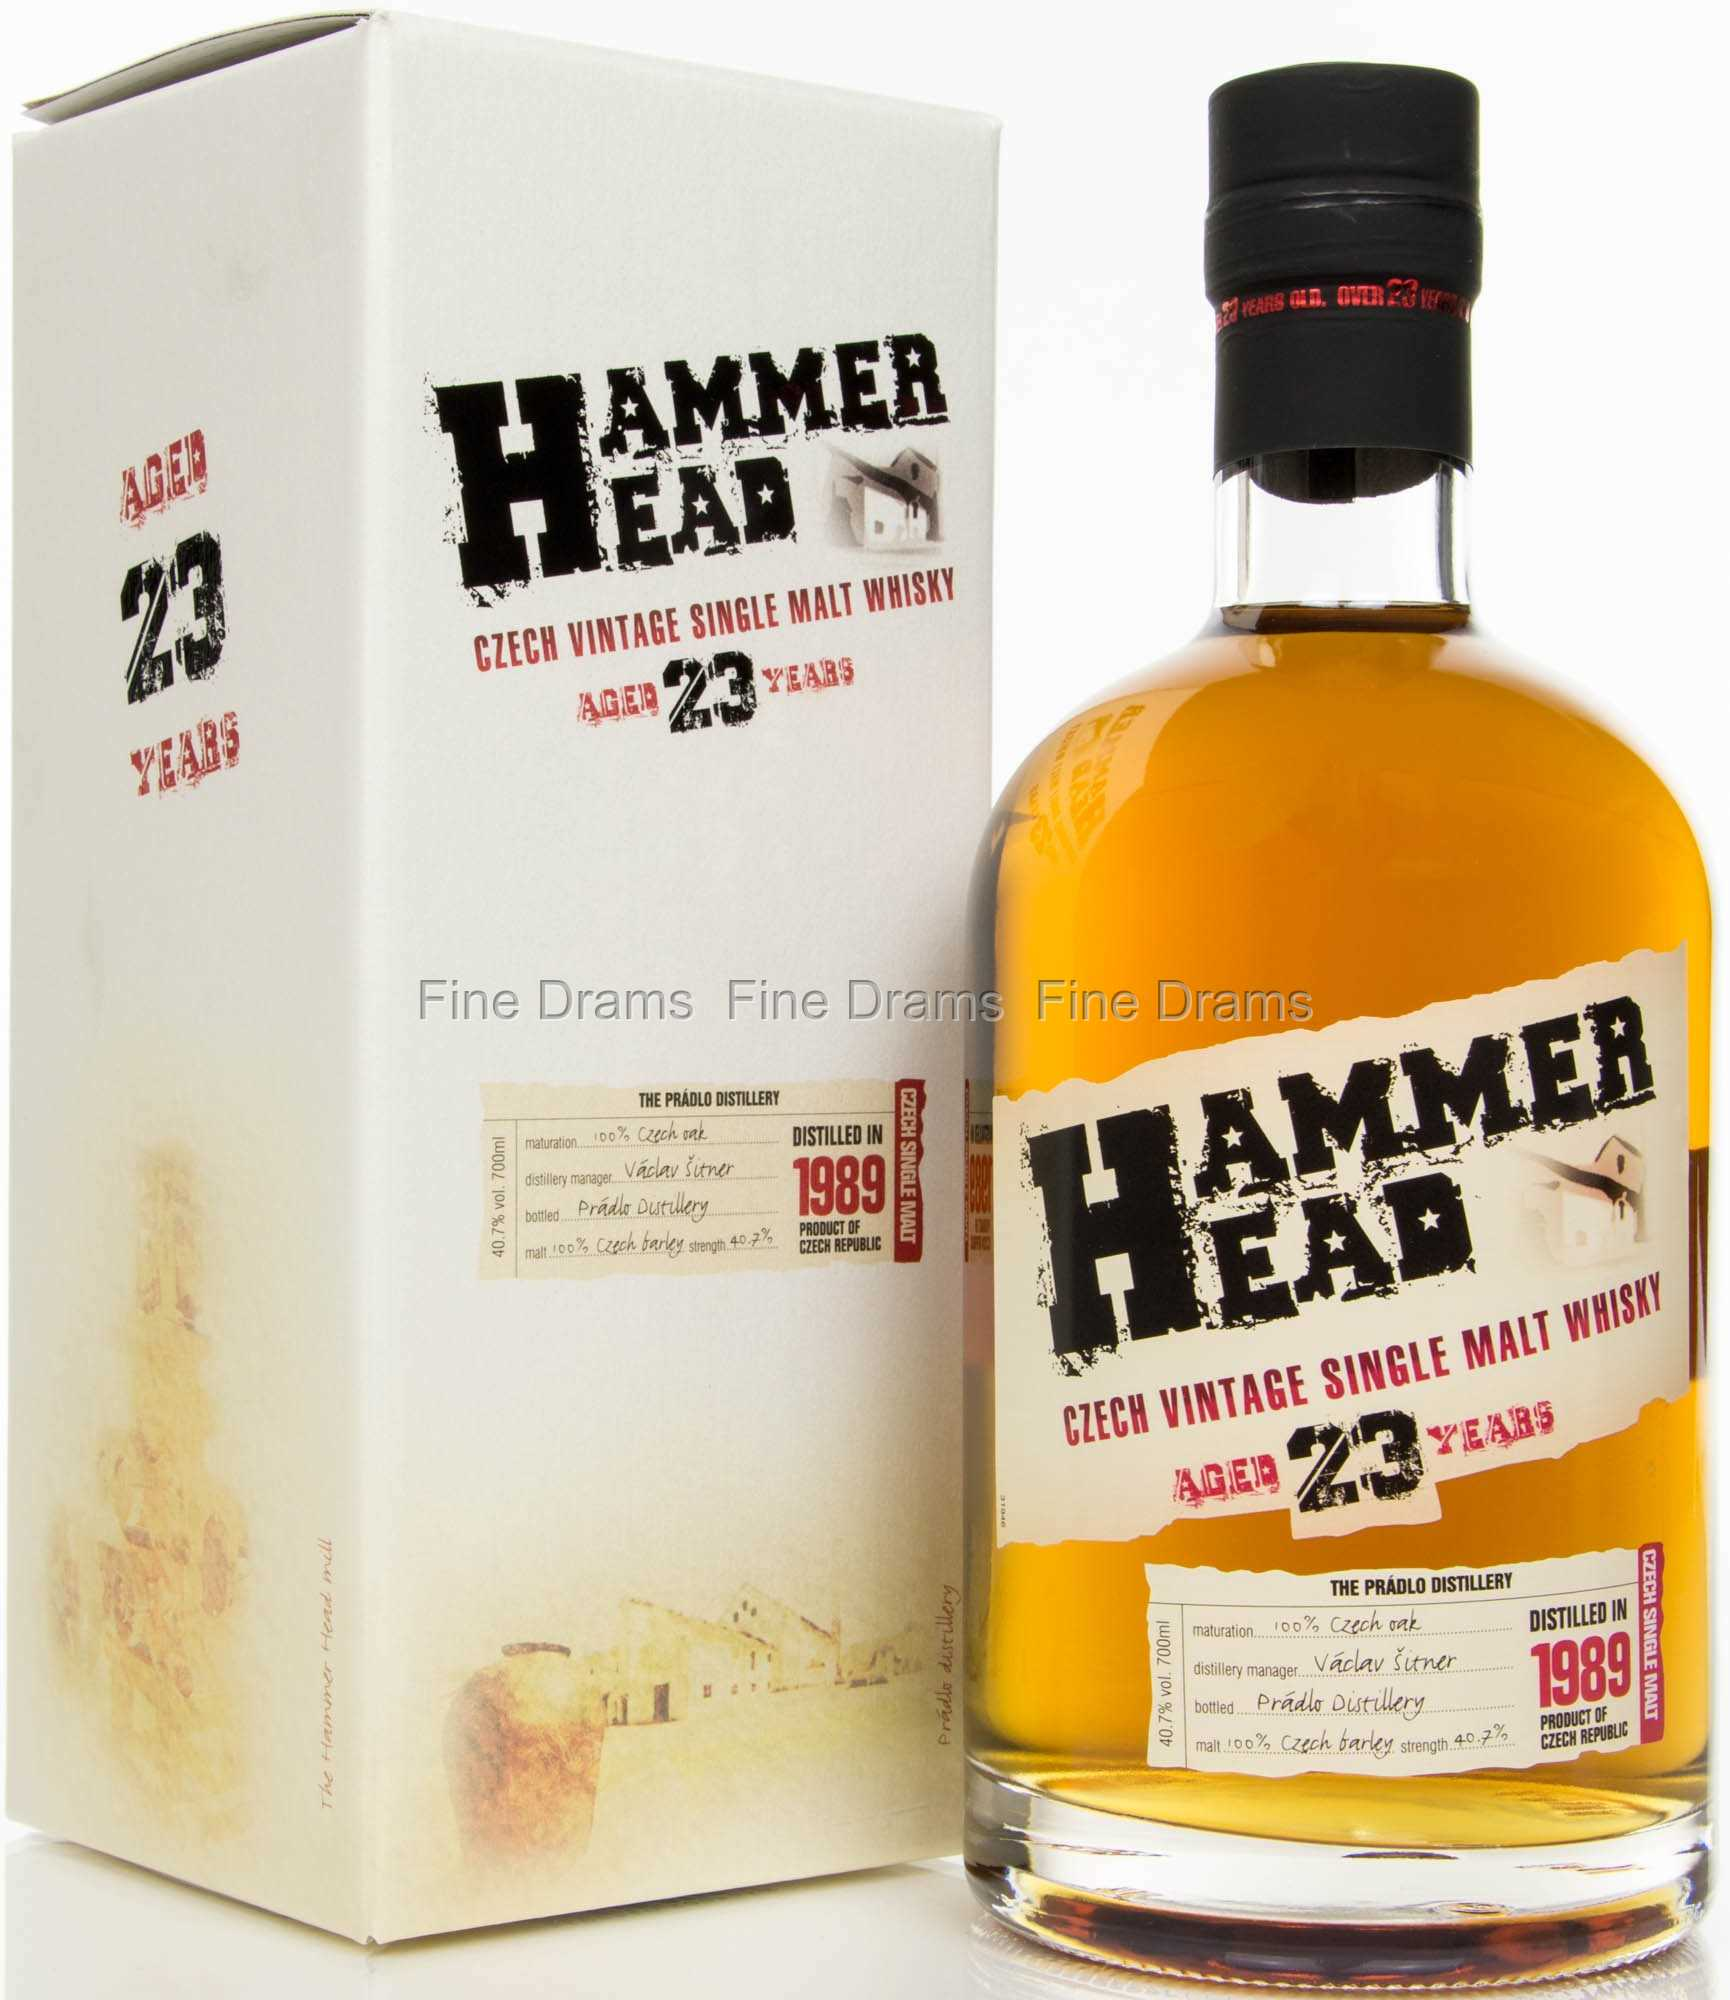 Hammerhead 23 Year Old Czech Single Malt Whisky